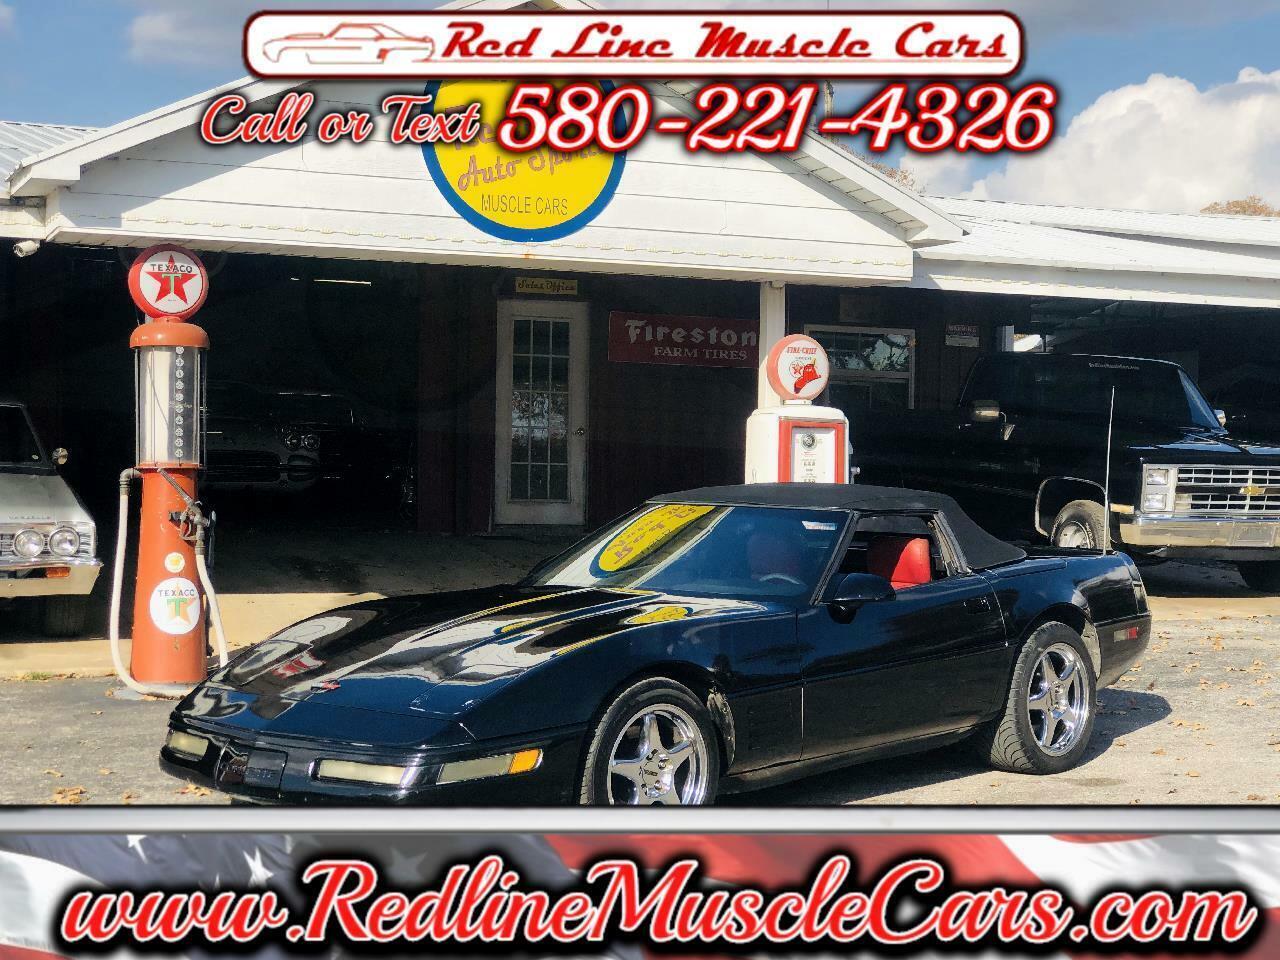 1991 Black Chevrolet Corvette Convertible  | C4 Corvette Photo 1